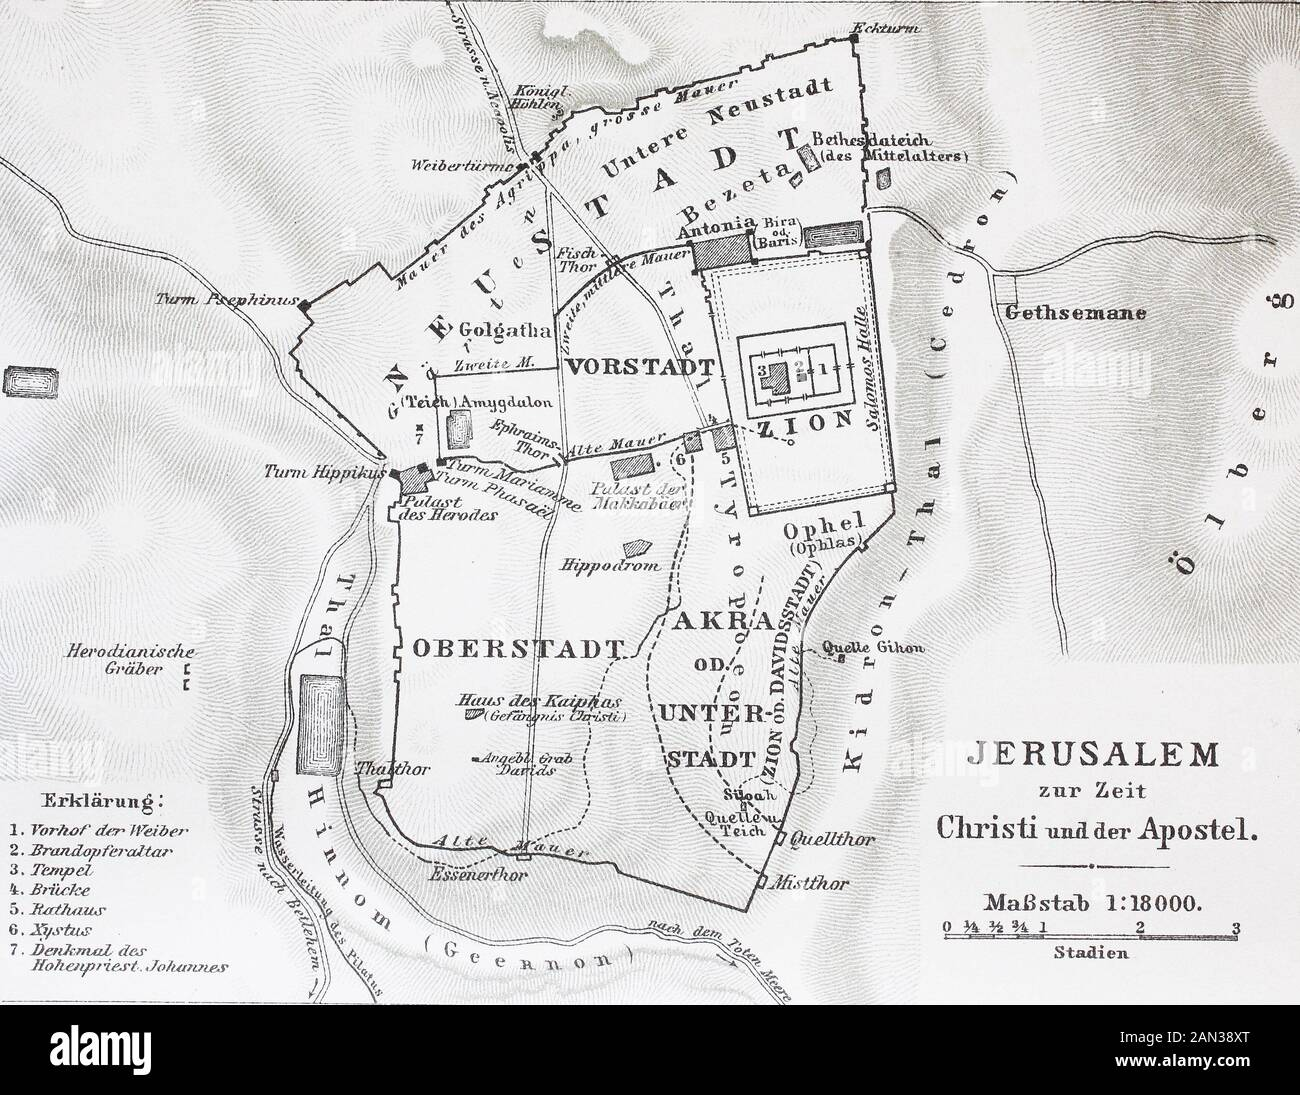 Mapa De Jerusalén En El Tiempo De Jesucristo Karte Von Jerusalem Zur Zeit Jesús Christus Historisch